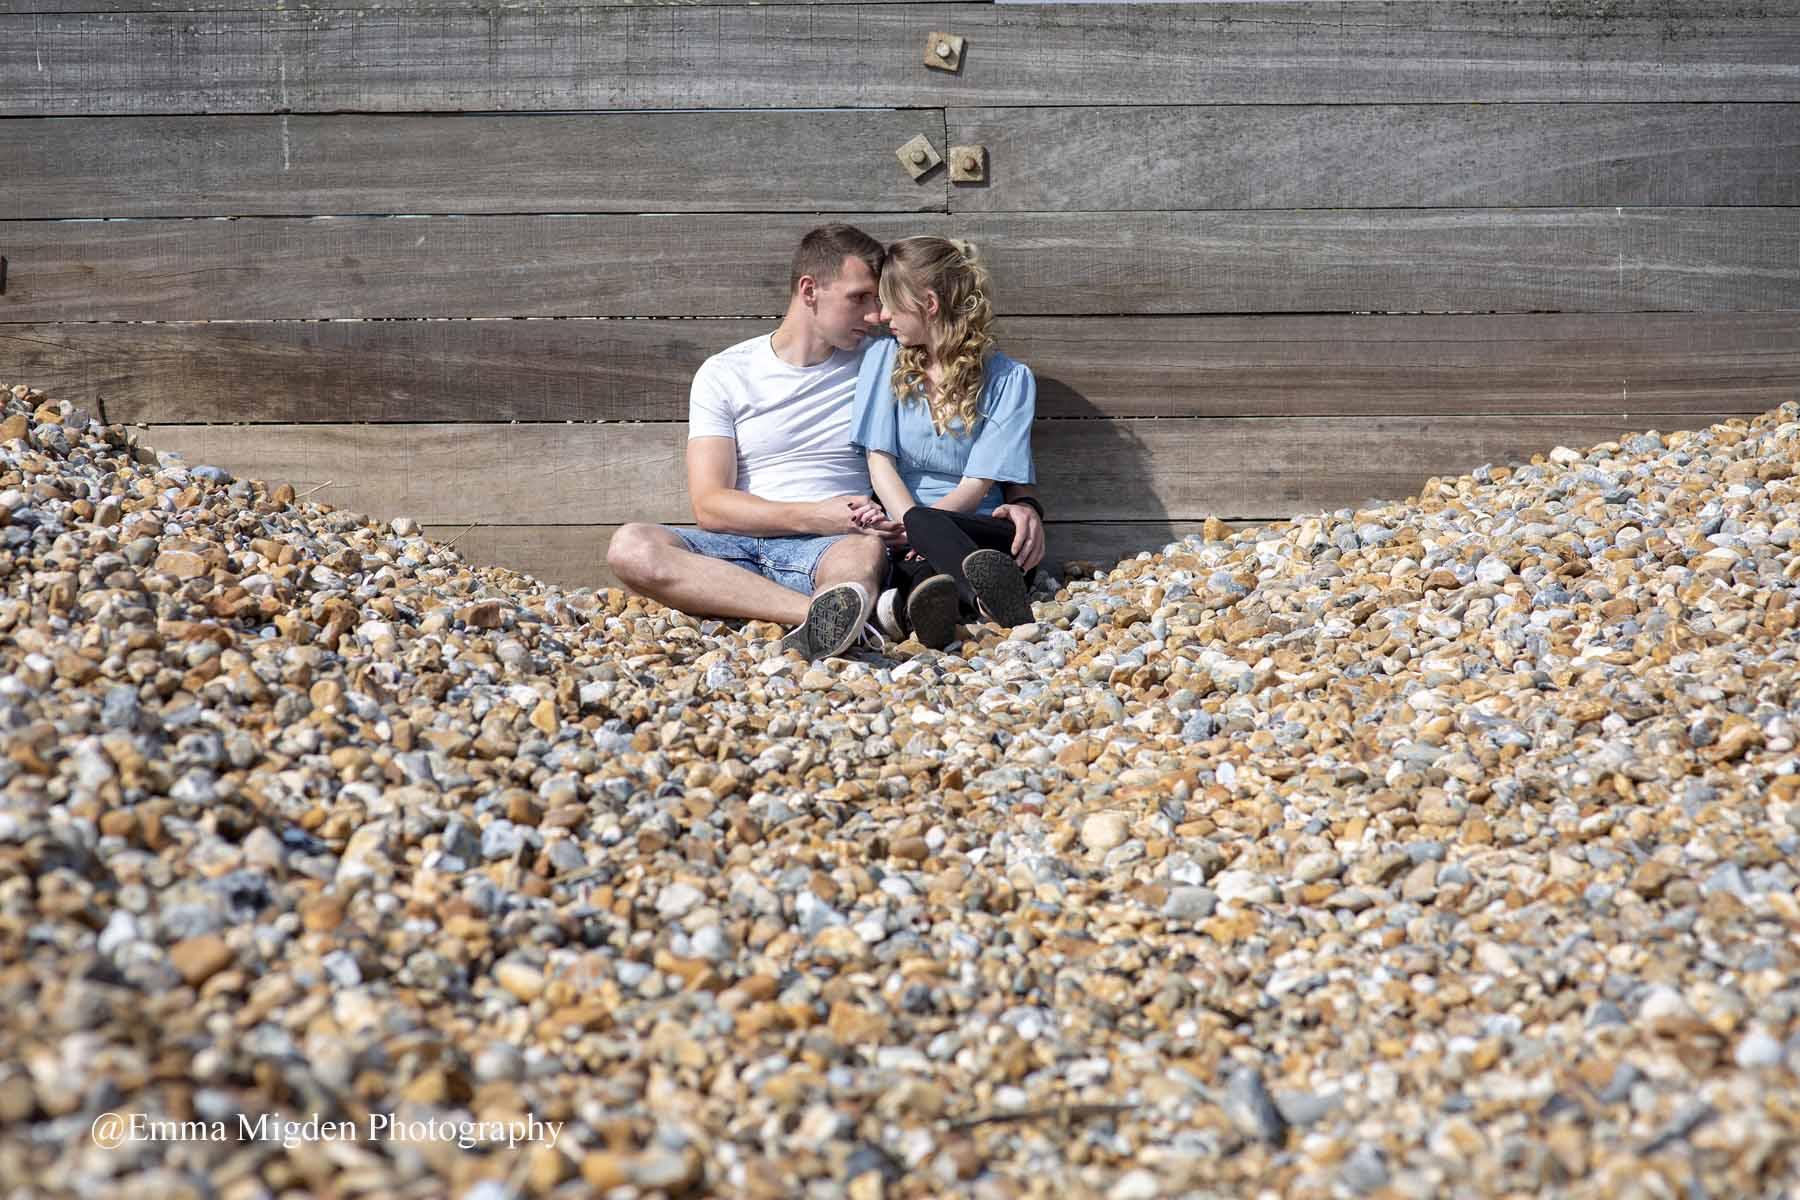 Tankerton Beach//Engagement Shoot//Emma Migden Photography